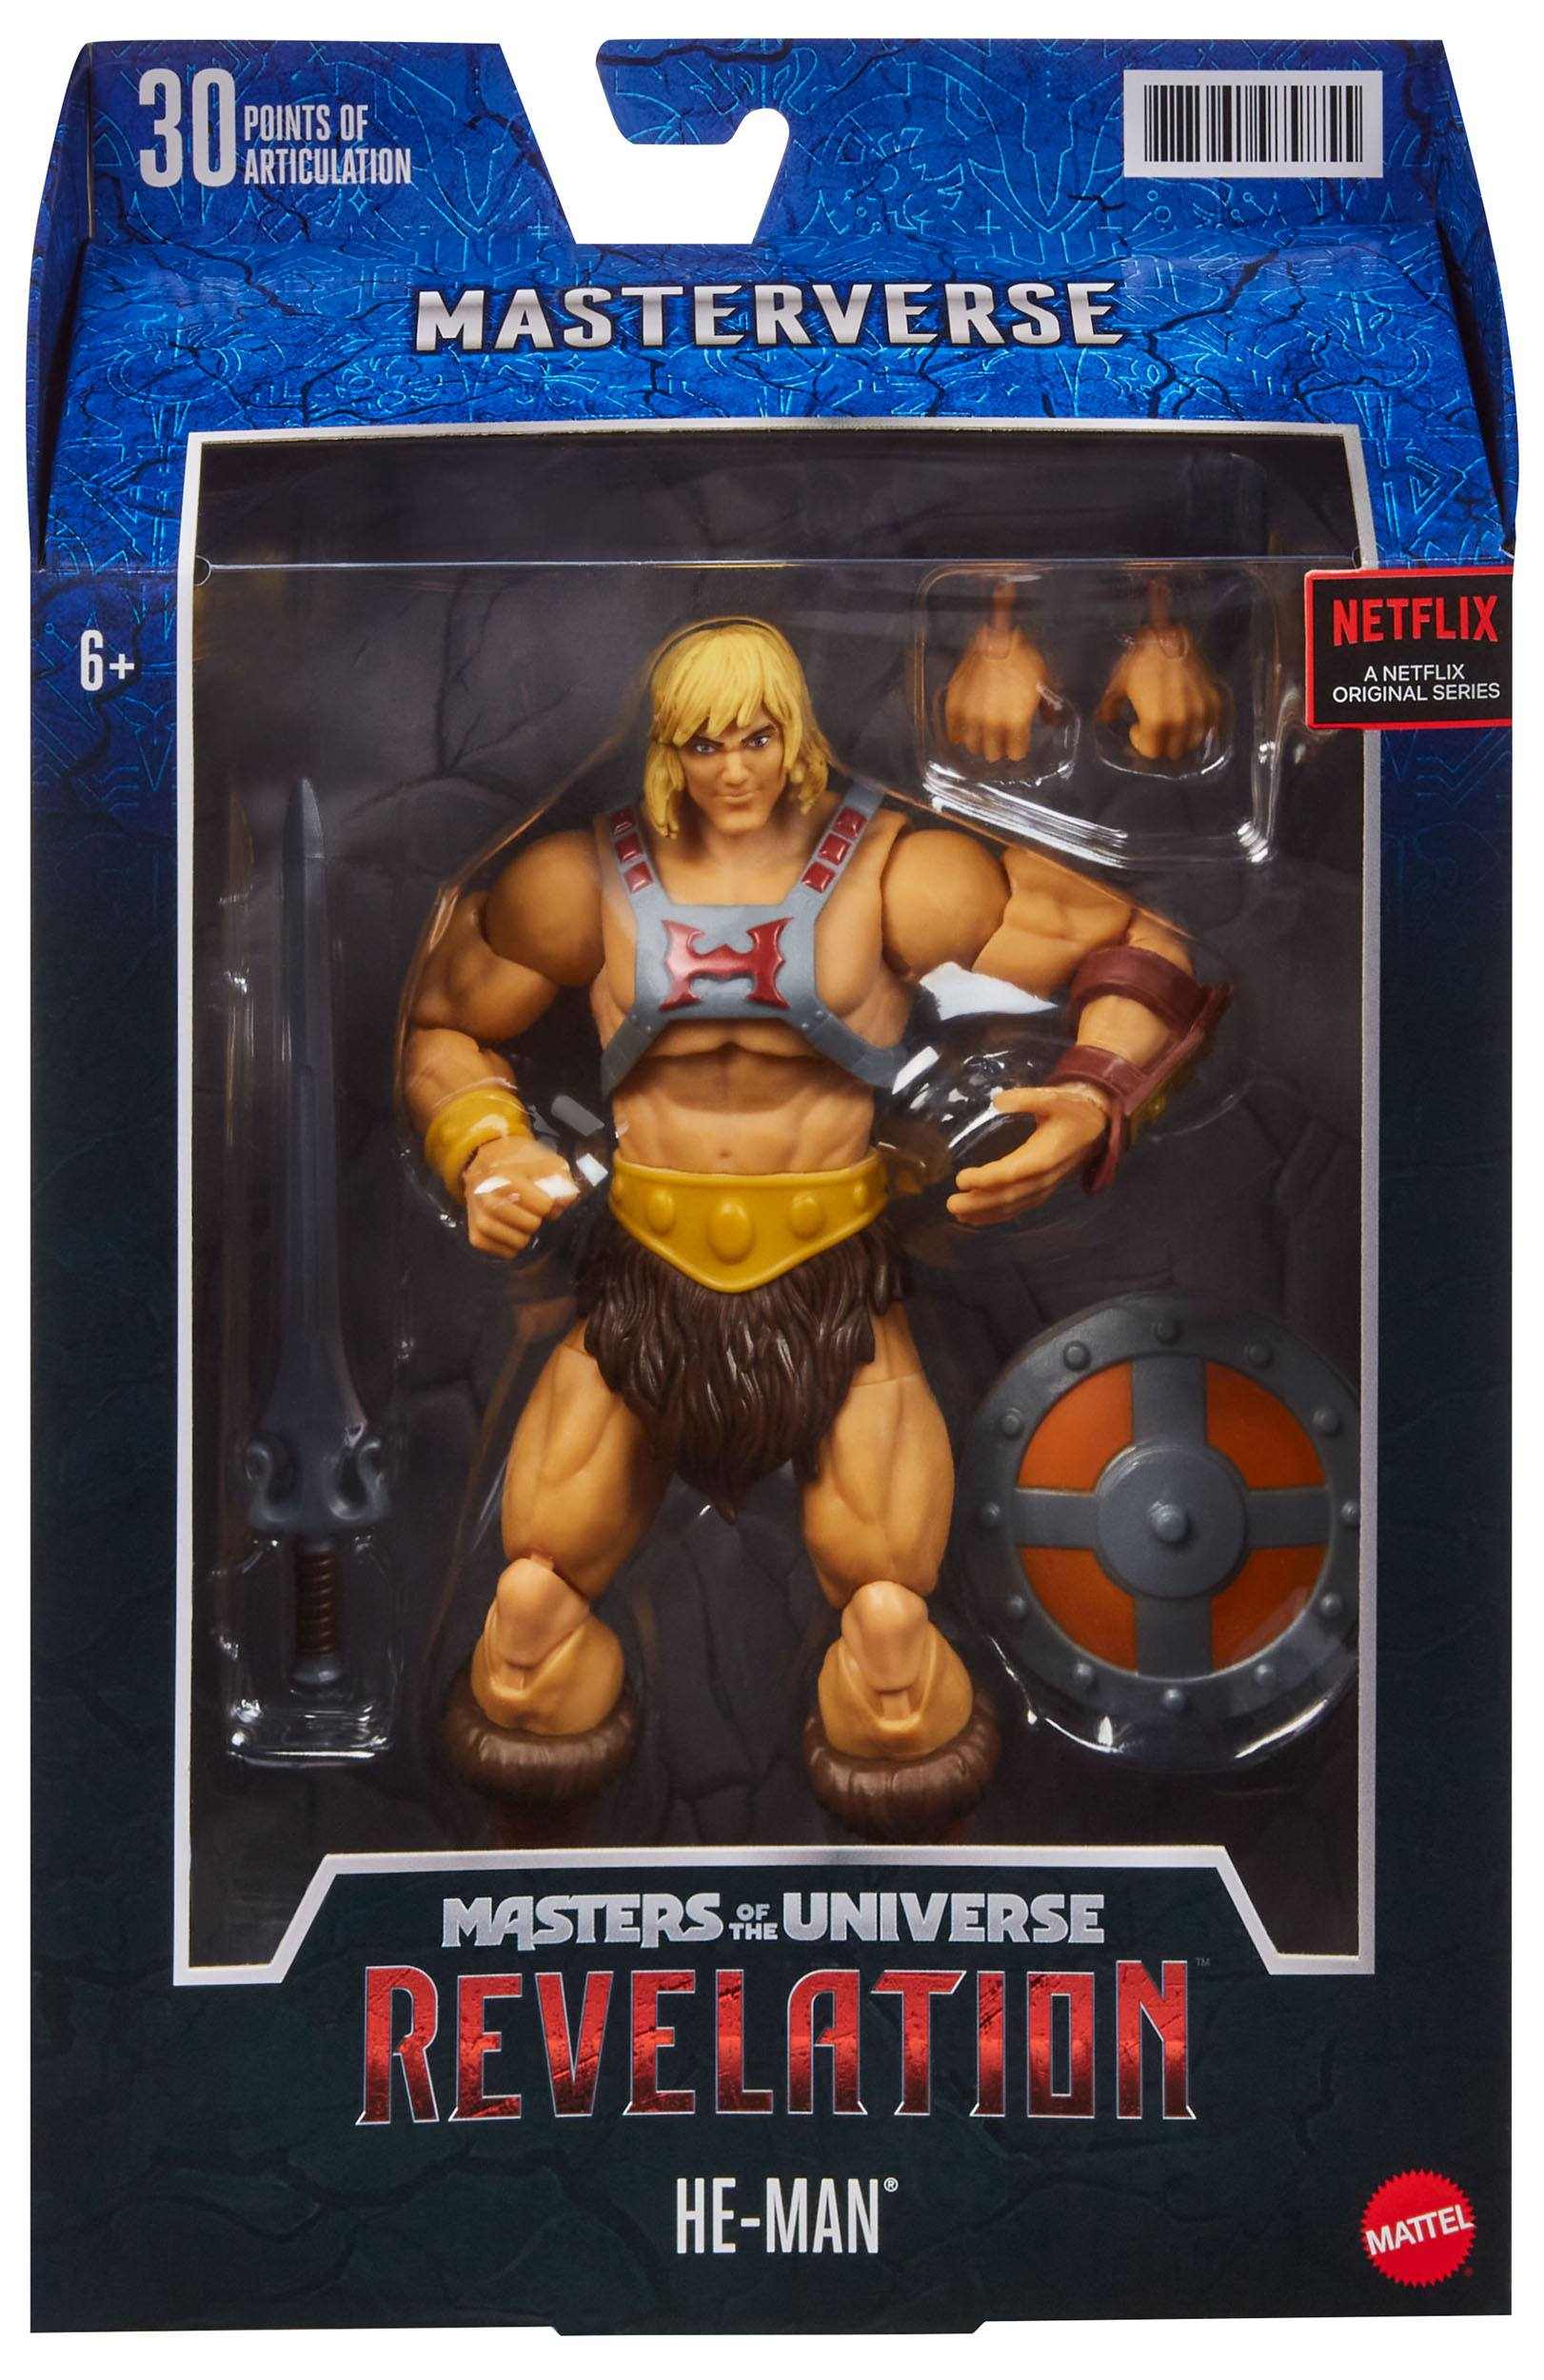 Masters of the Universe: Revelation Masterverse Actionfigur 2021 He-Man 18 cm MATTGYV09 0887961979855